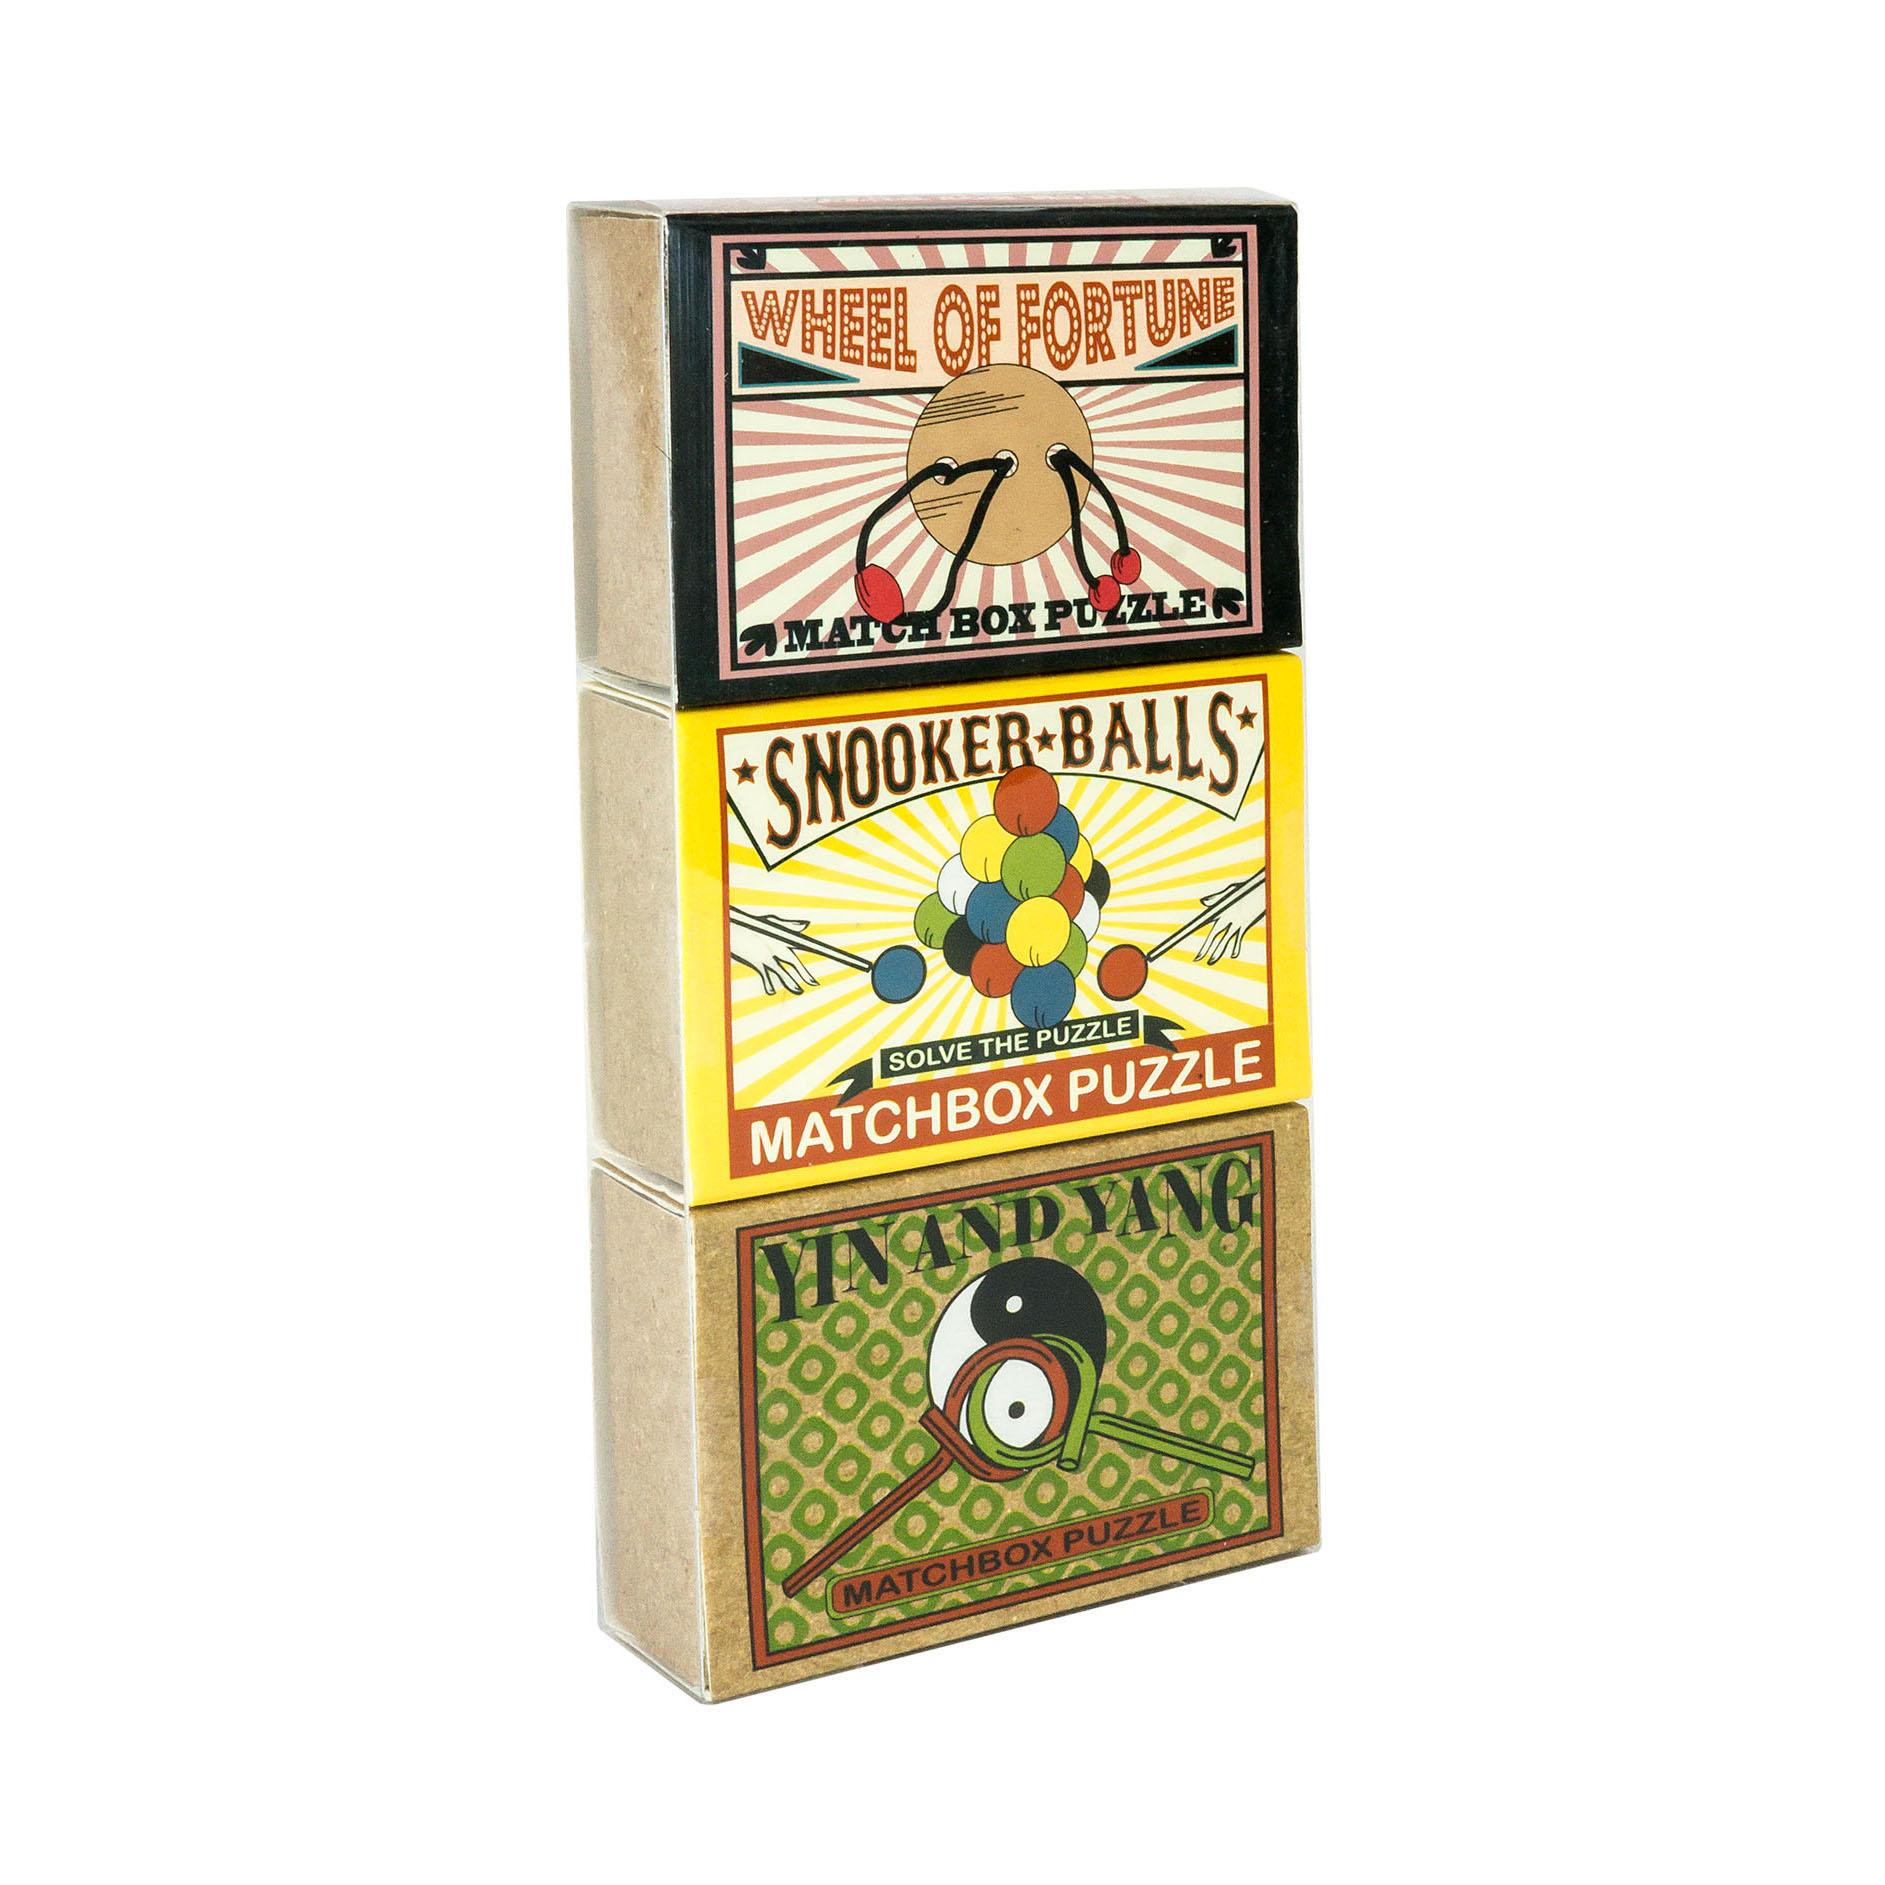 Matchbox3Packs - 1